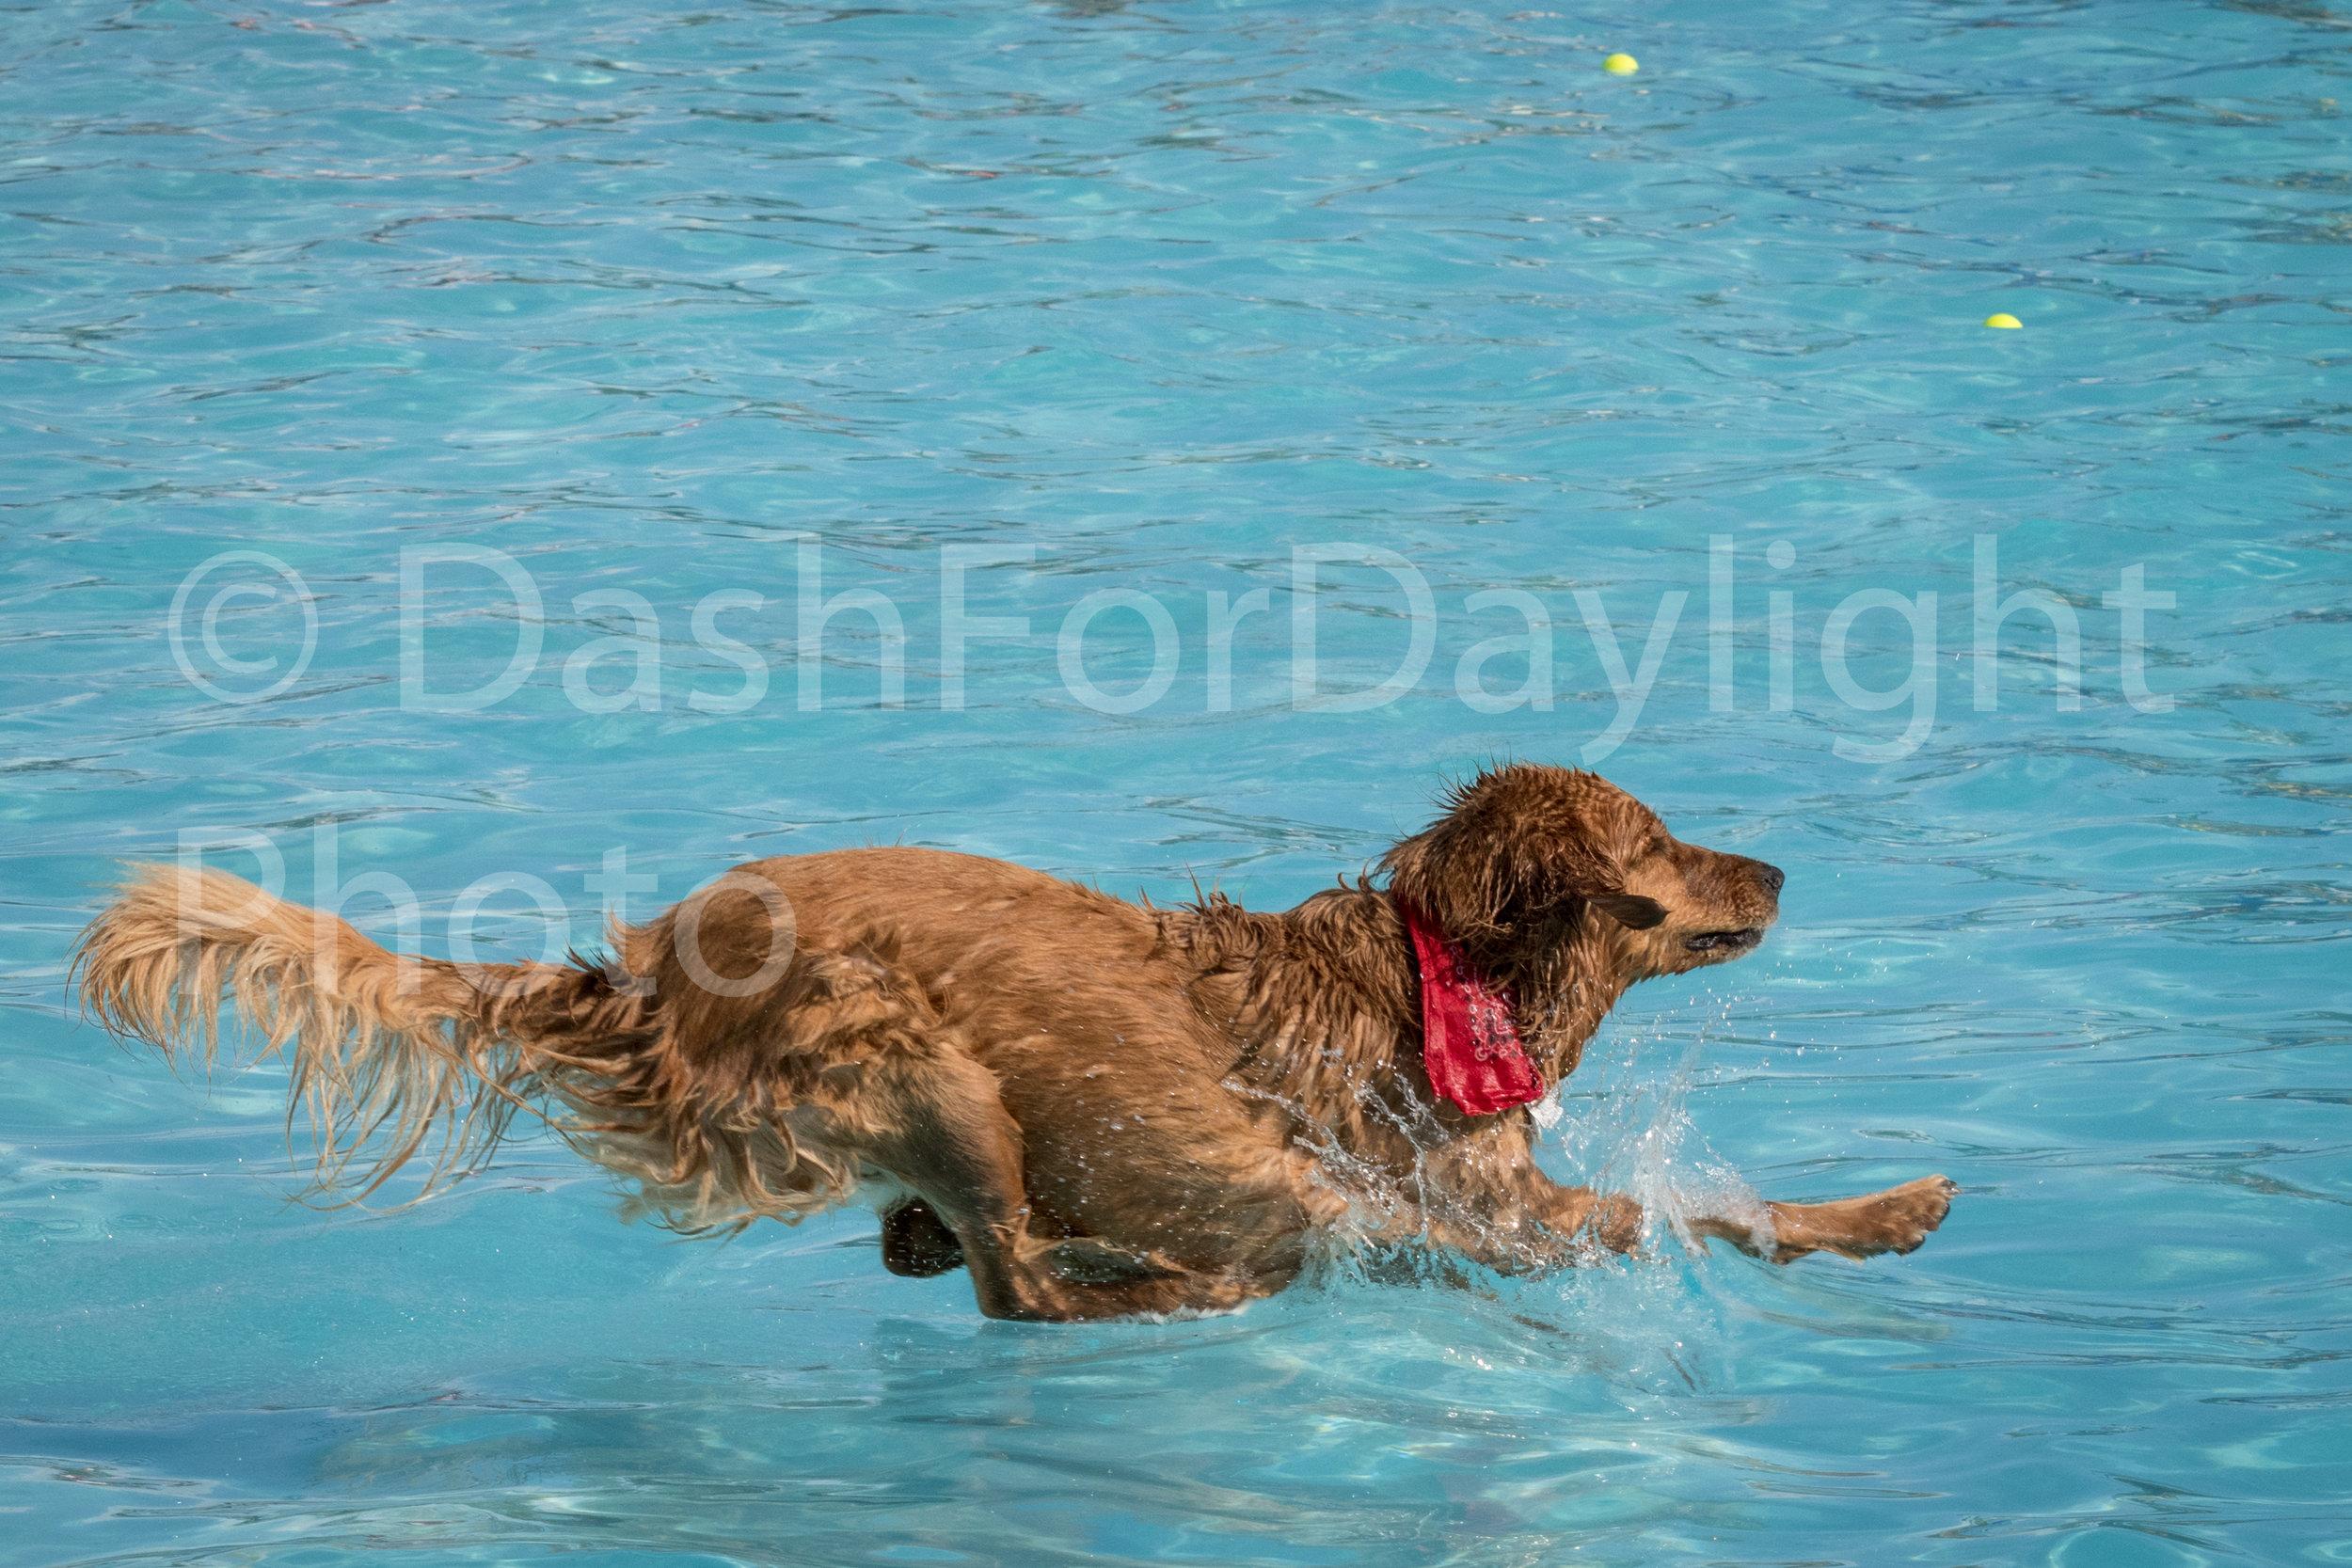 #1106 Turner Splashdown